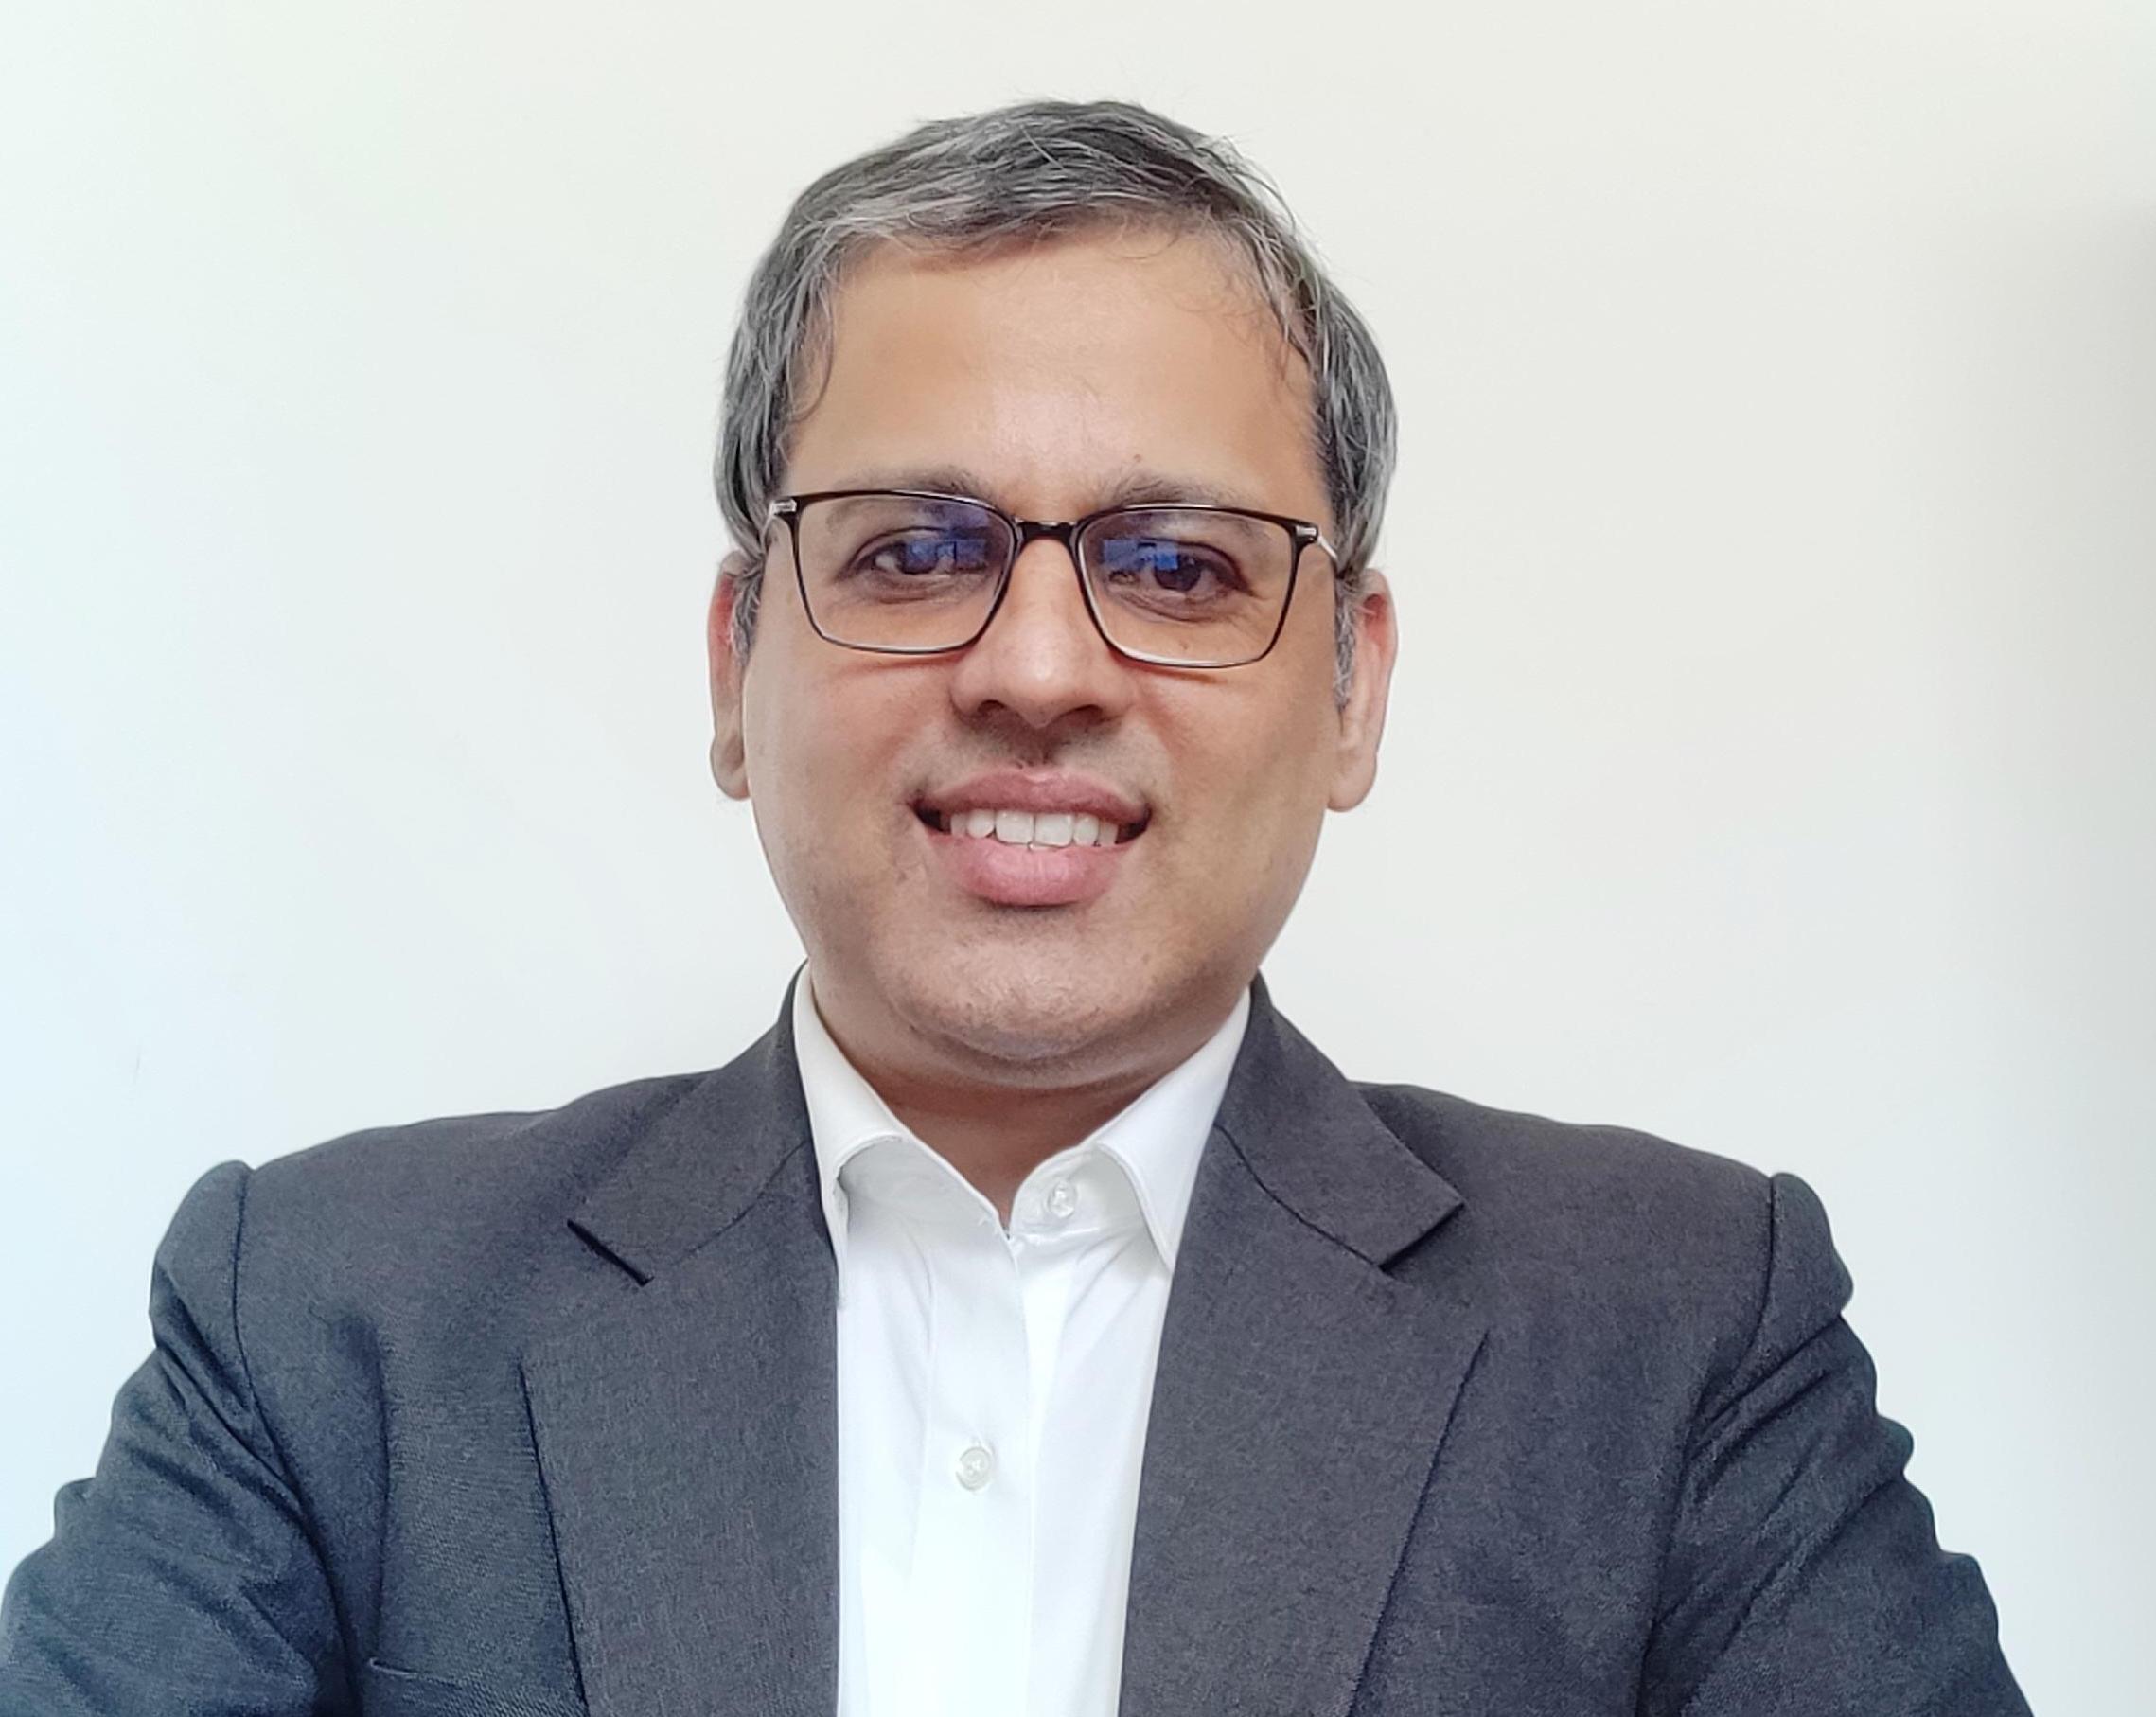 Samir Sathe, Wadhwani Foundation, Wadhwani Advantage,